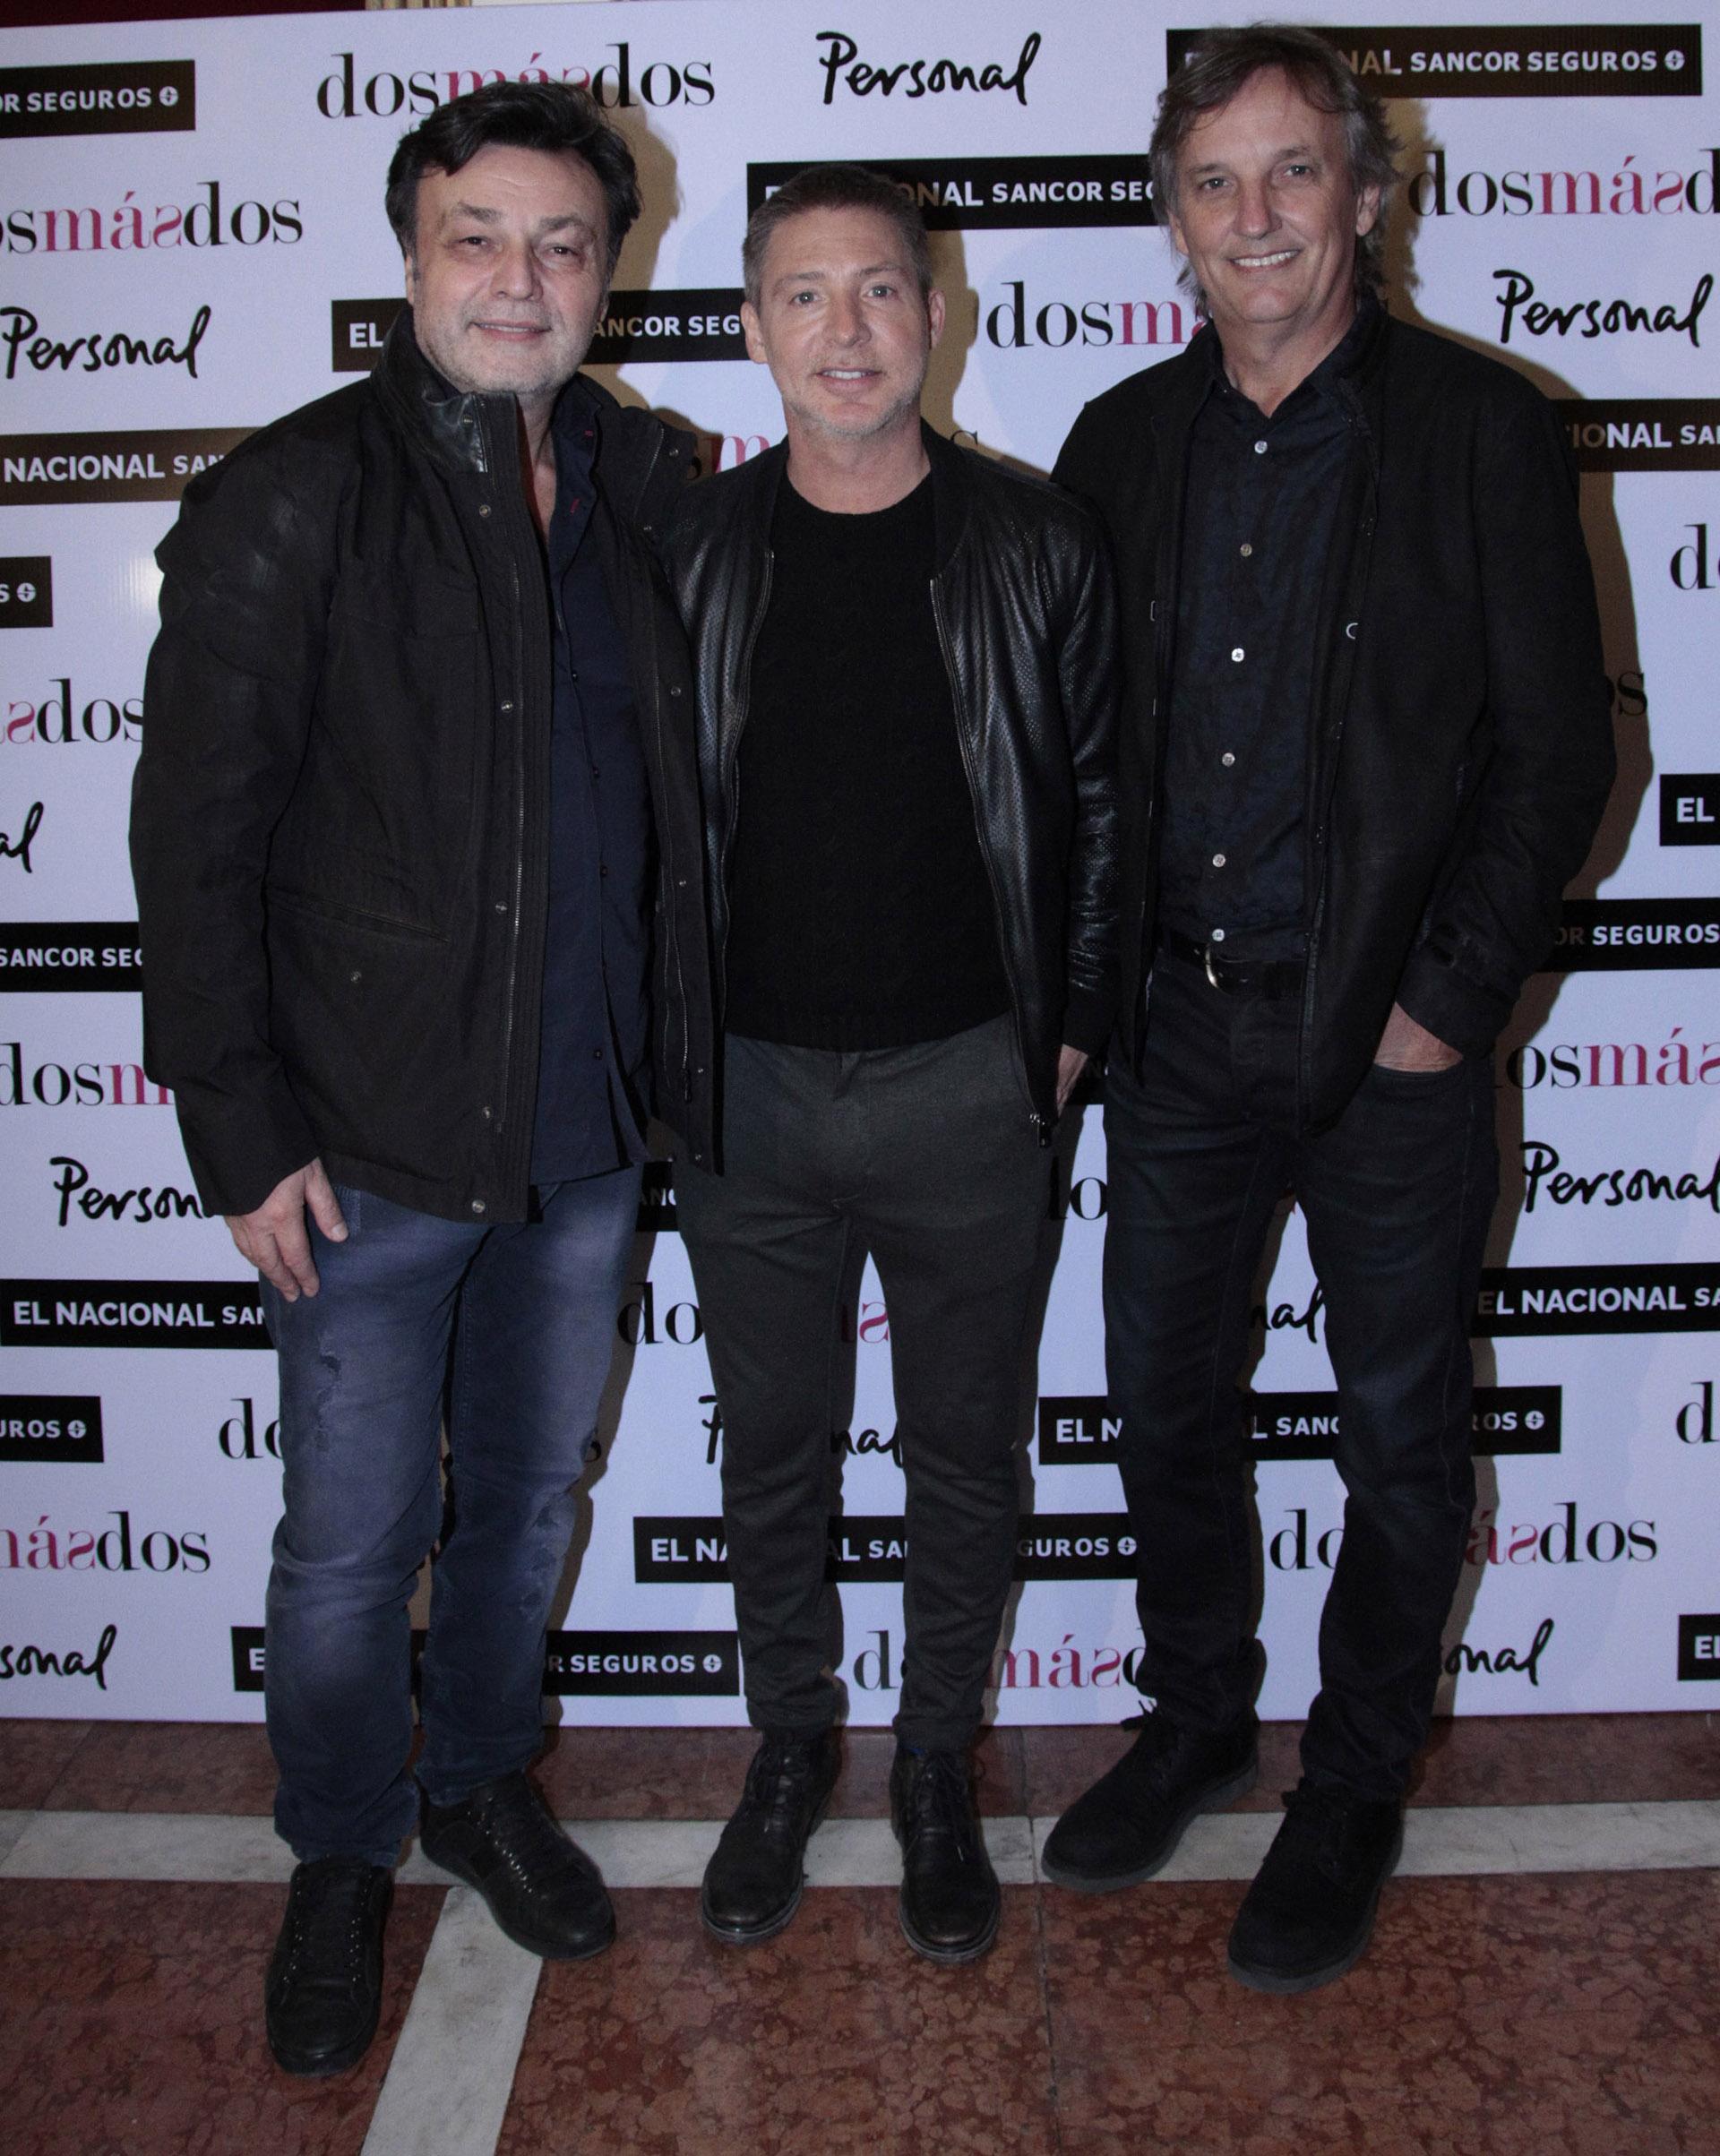 Marcos Carnevale, Adrián Suar y Nacho Laviaguerre (C.Oppizzi)